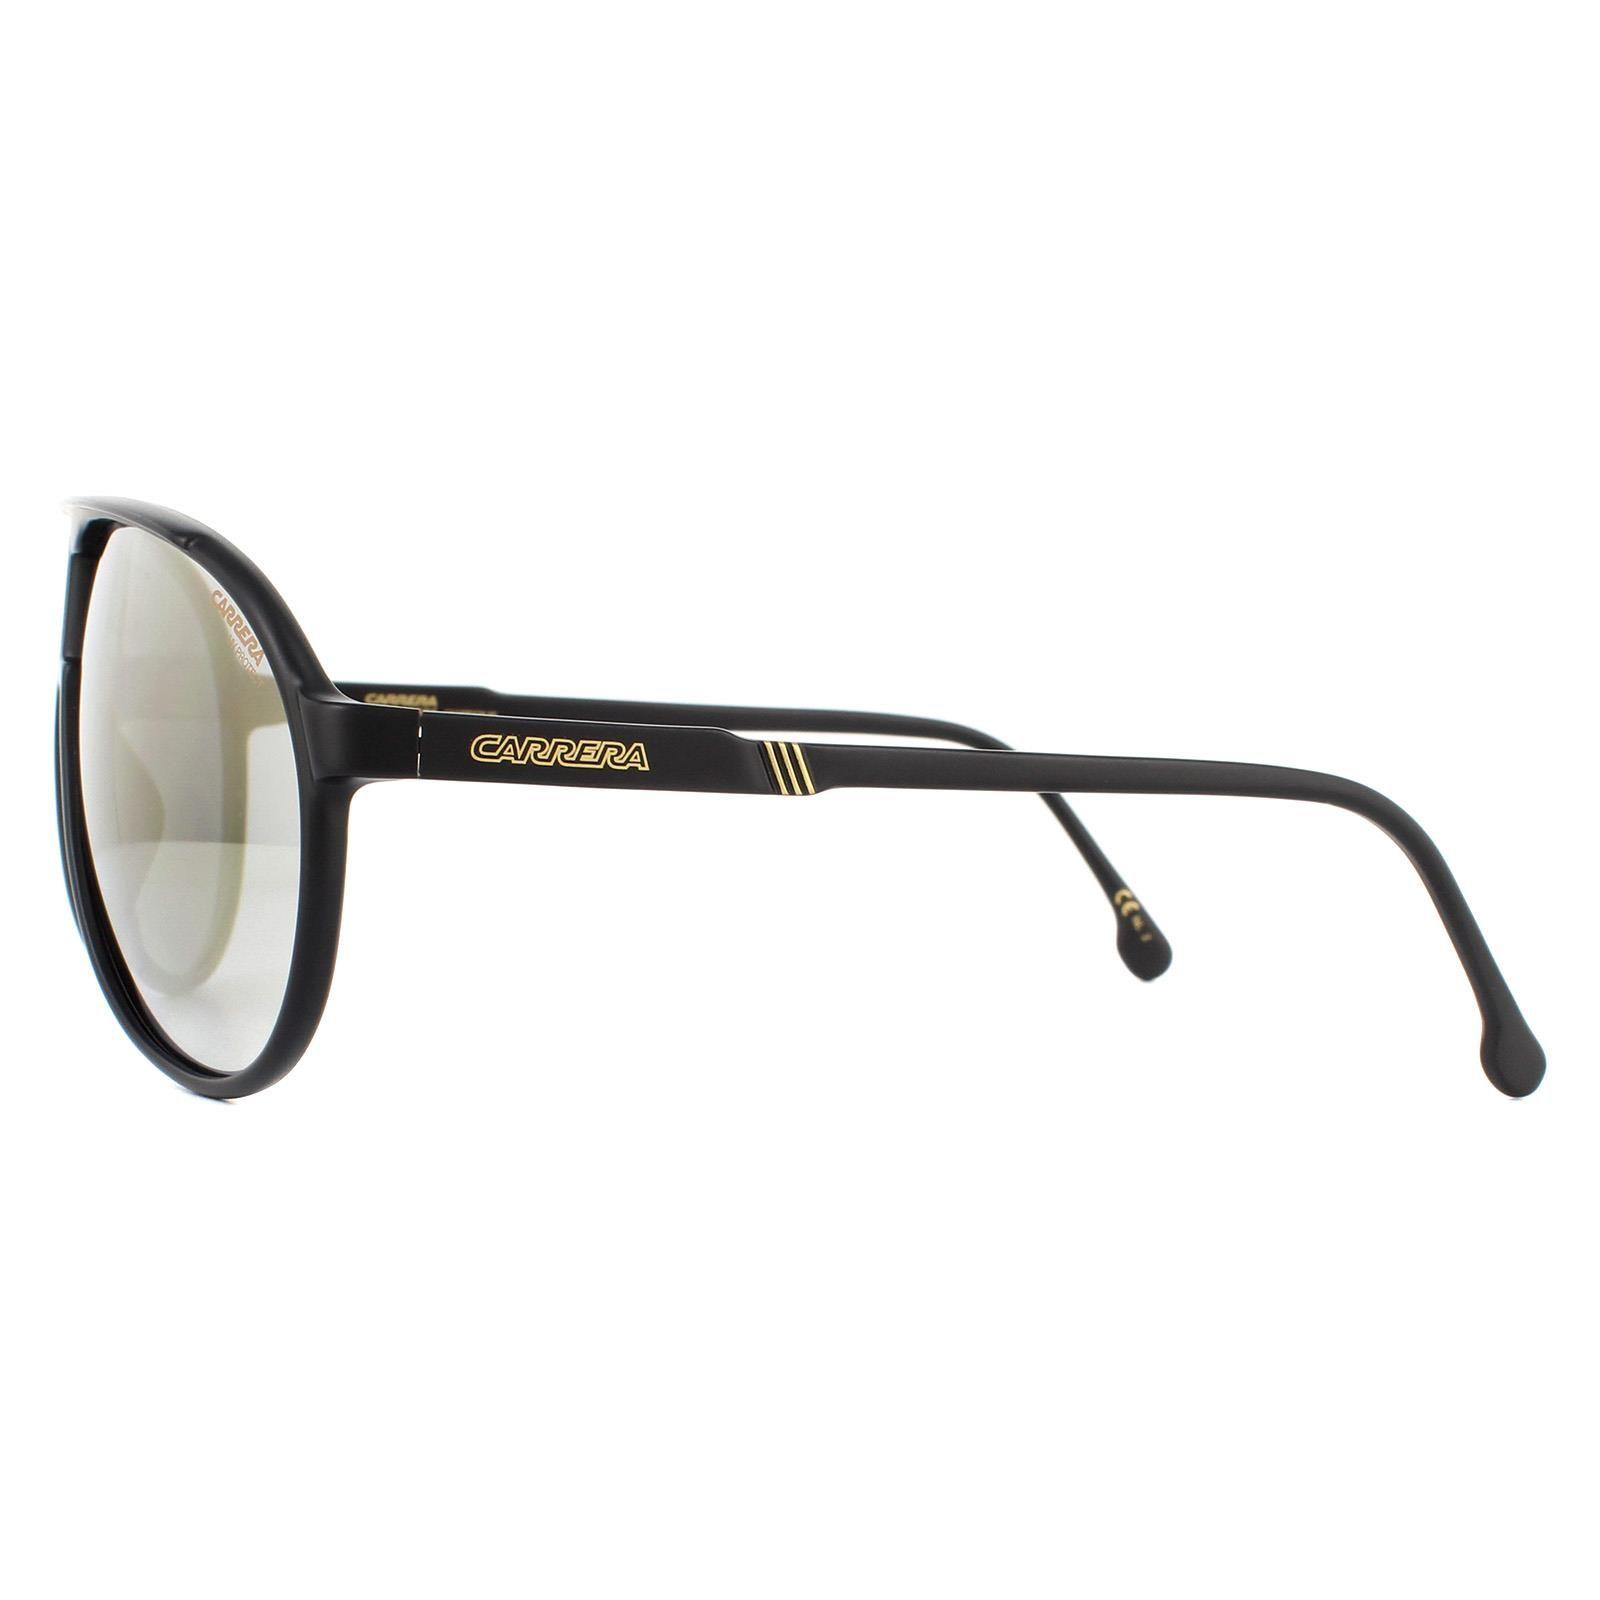 Carrera Sunglasses Champion 65 LHF/9O Burgundy Dark Grey Gradient